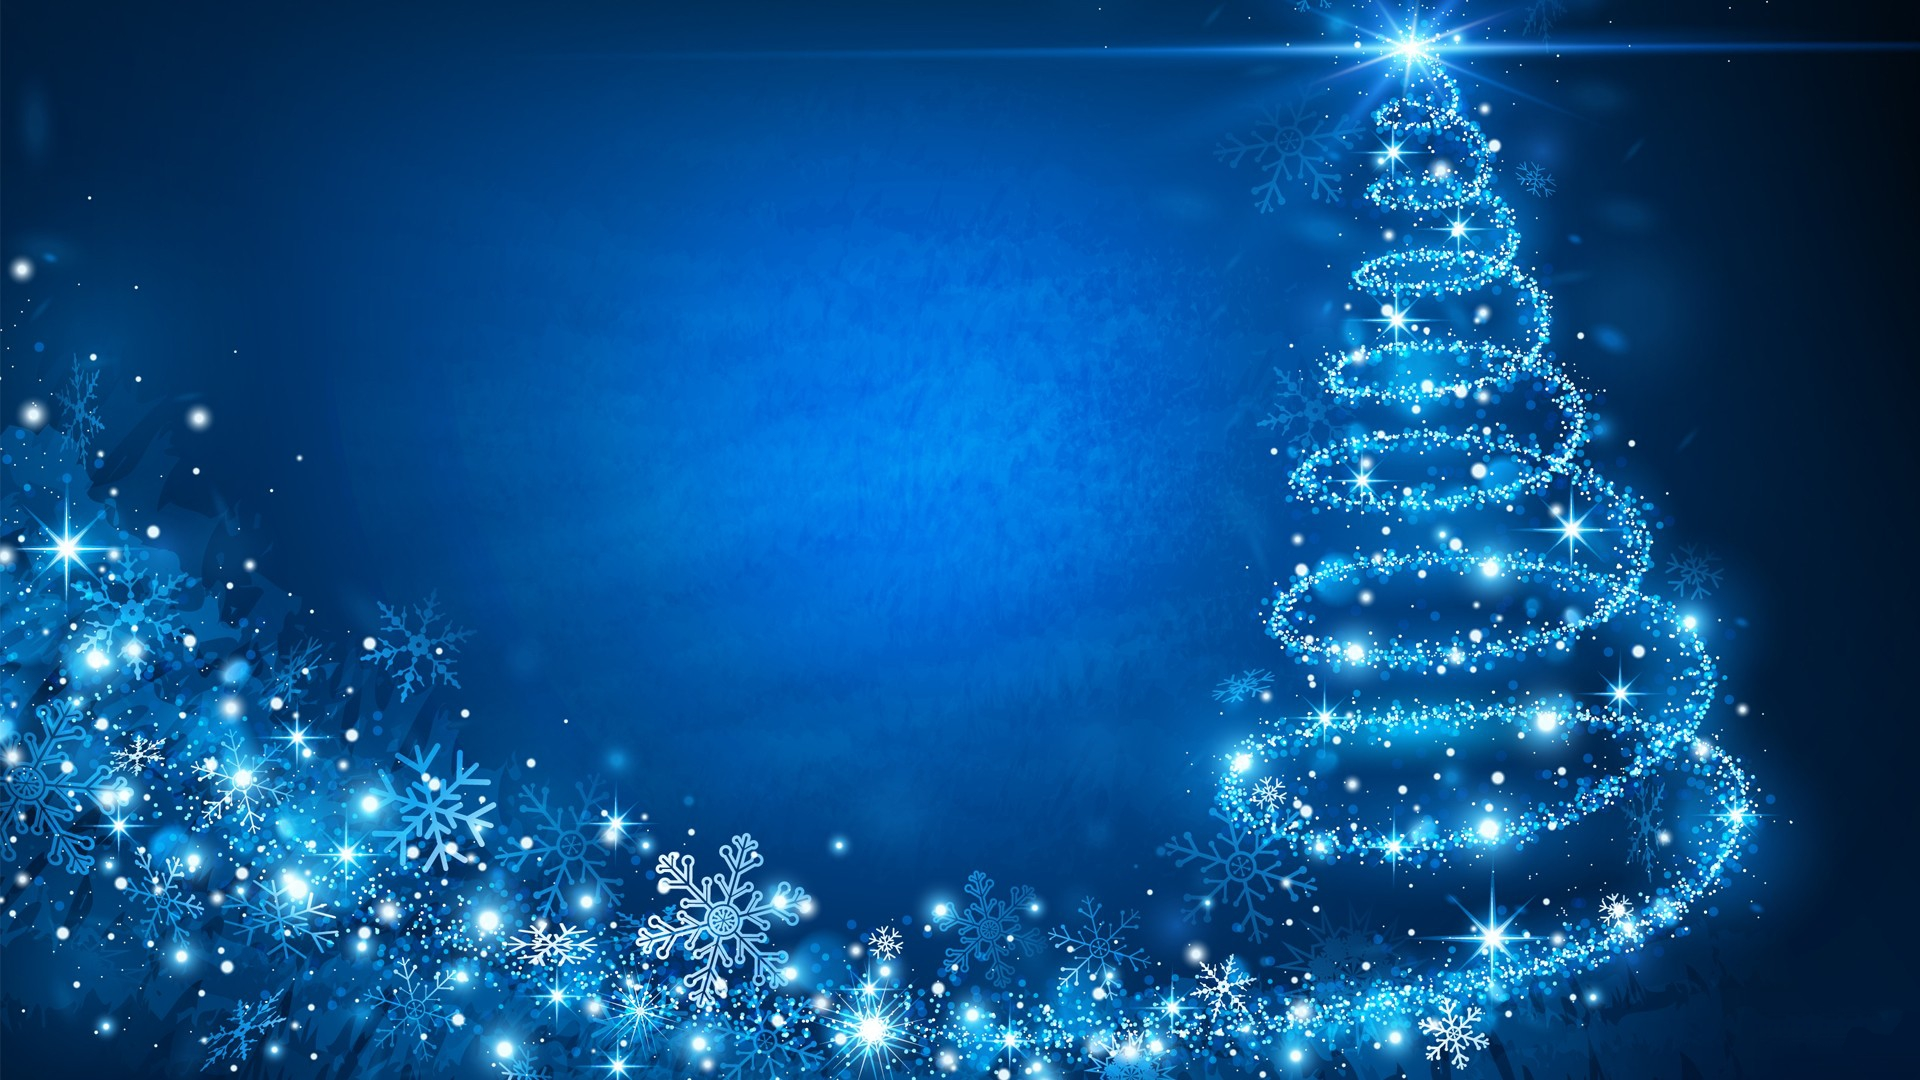 Blue Christmas Wallpaper HD | PixelsTalk Net